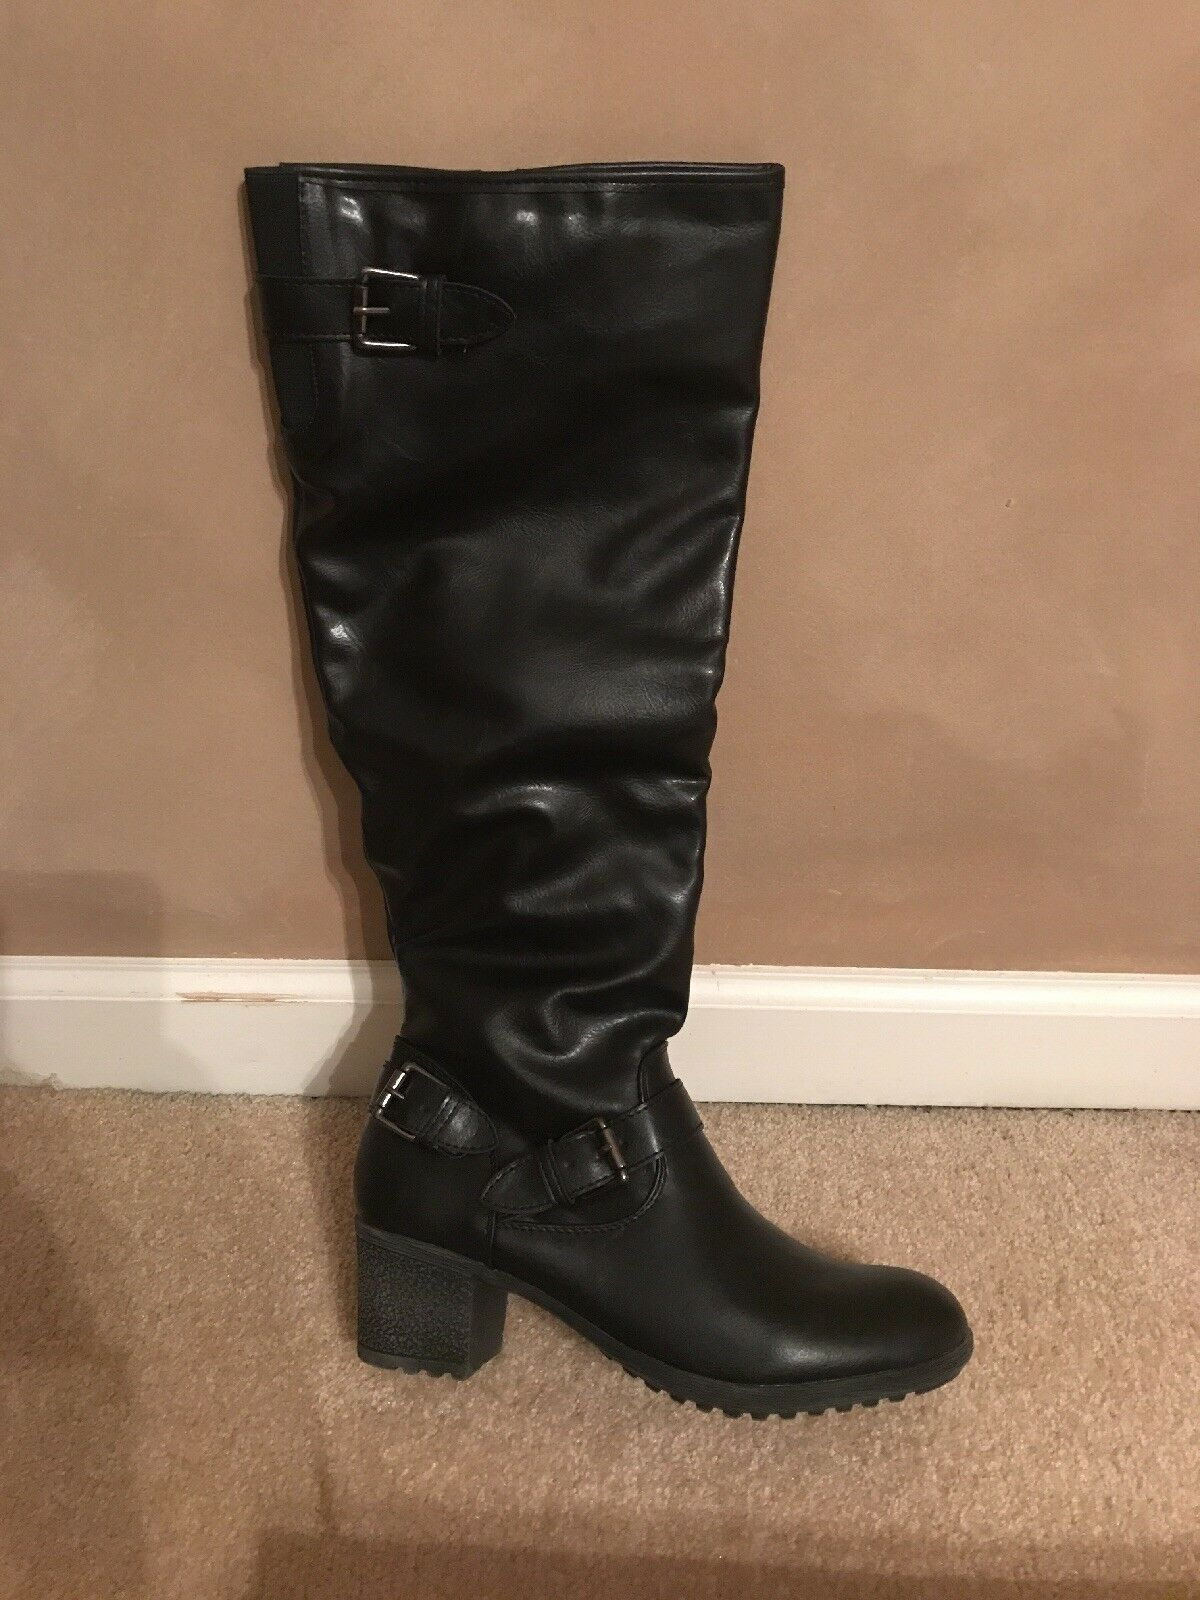 Modern Rush Women Black Ranger Boots, size 8.5